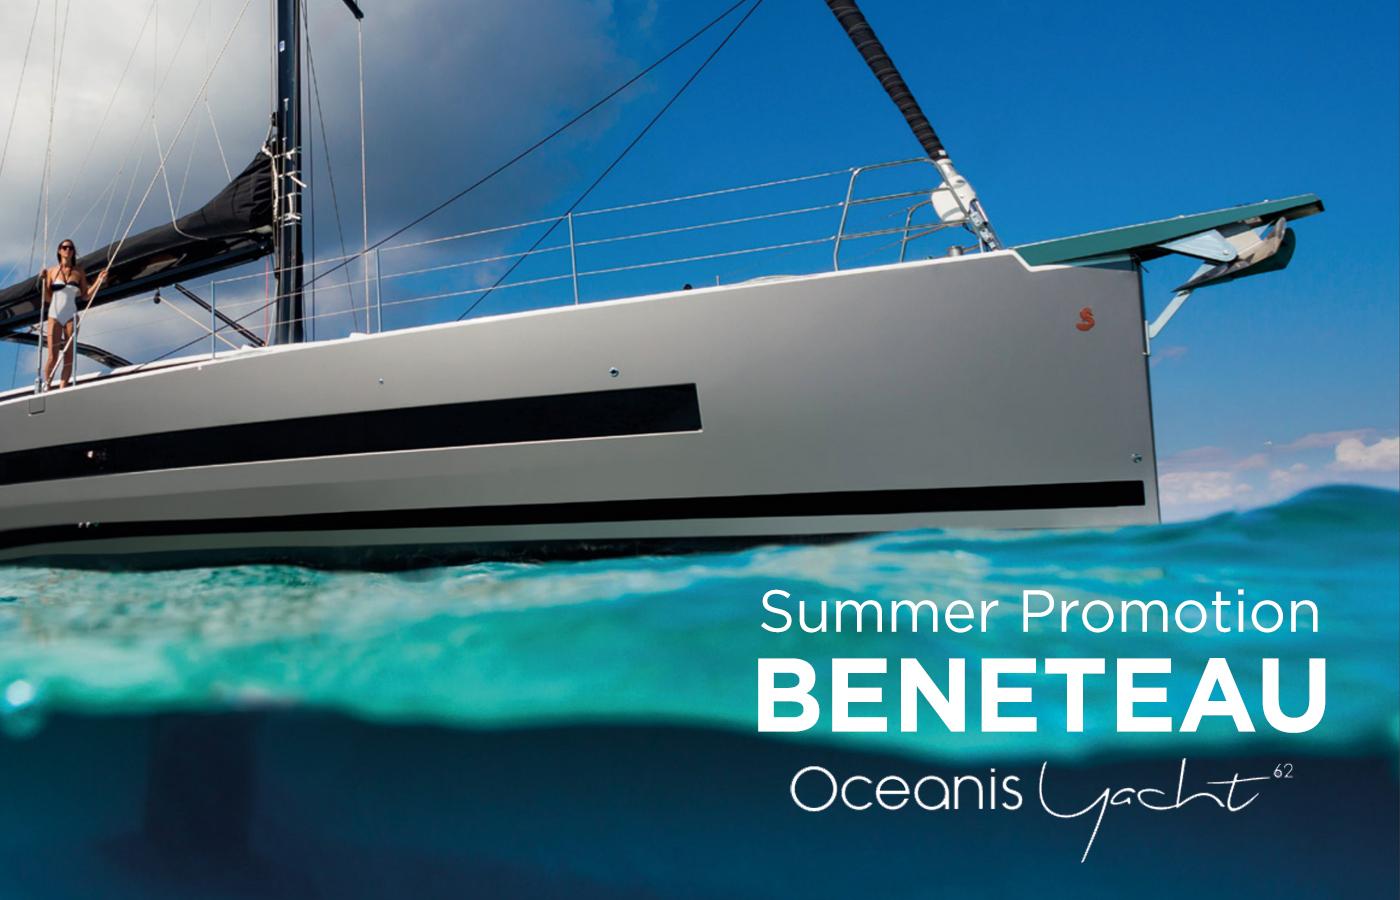 Beneteau Summer Promotion Oceanis 62 Yacht [Sailboat For Sale]